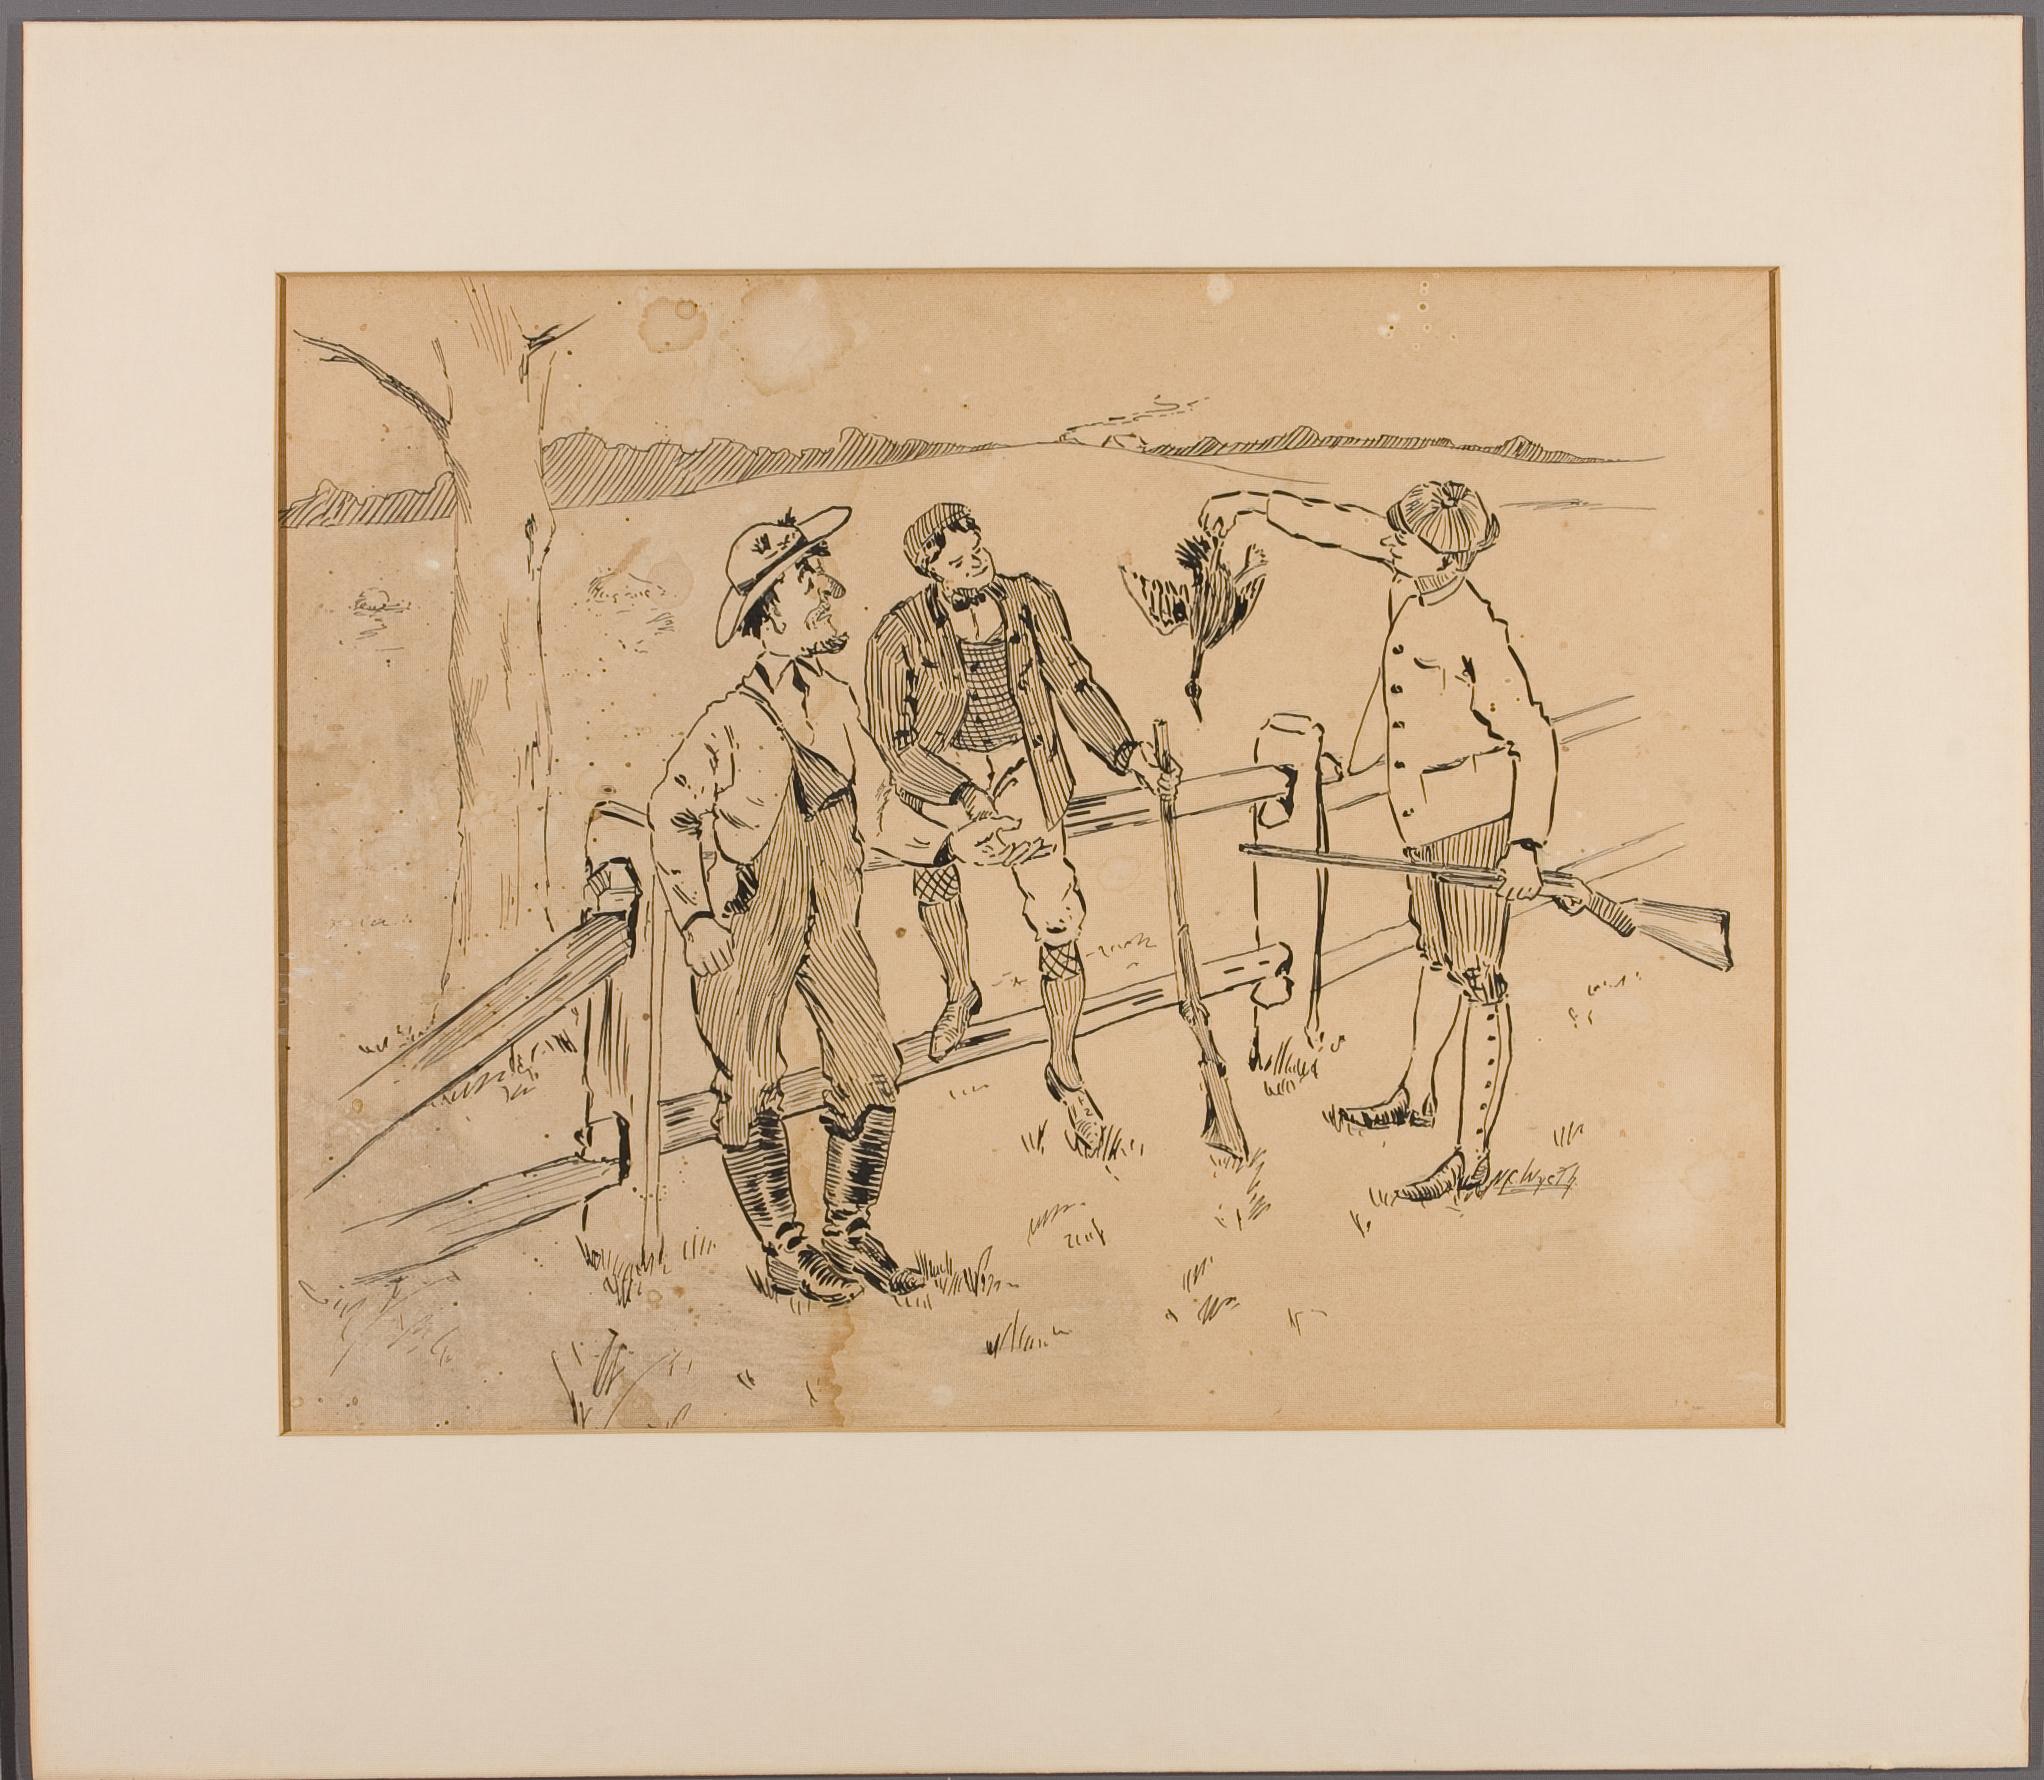 NC_Wyeth_drawing-01-before